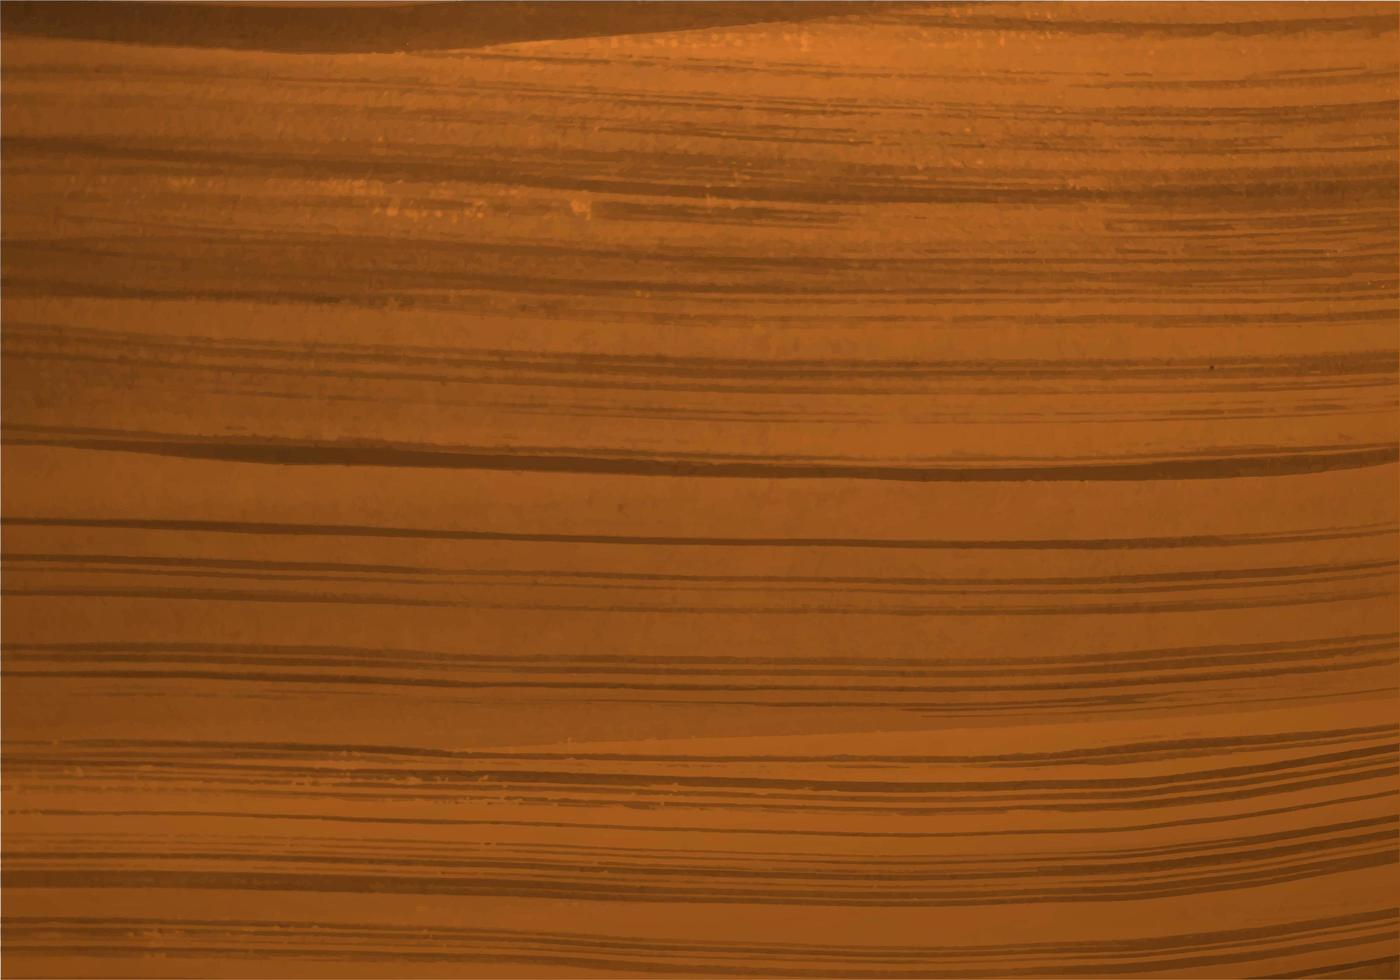 abstrakte braune Holzstruktur vektor